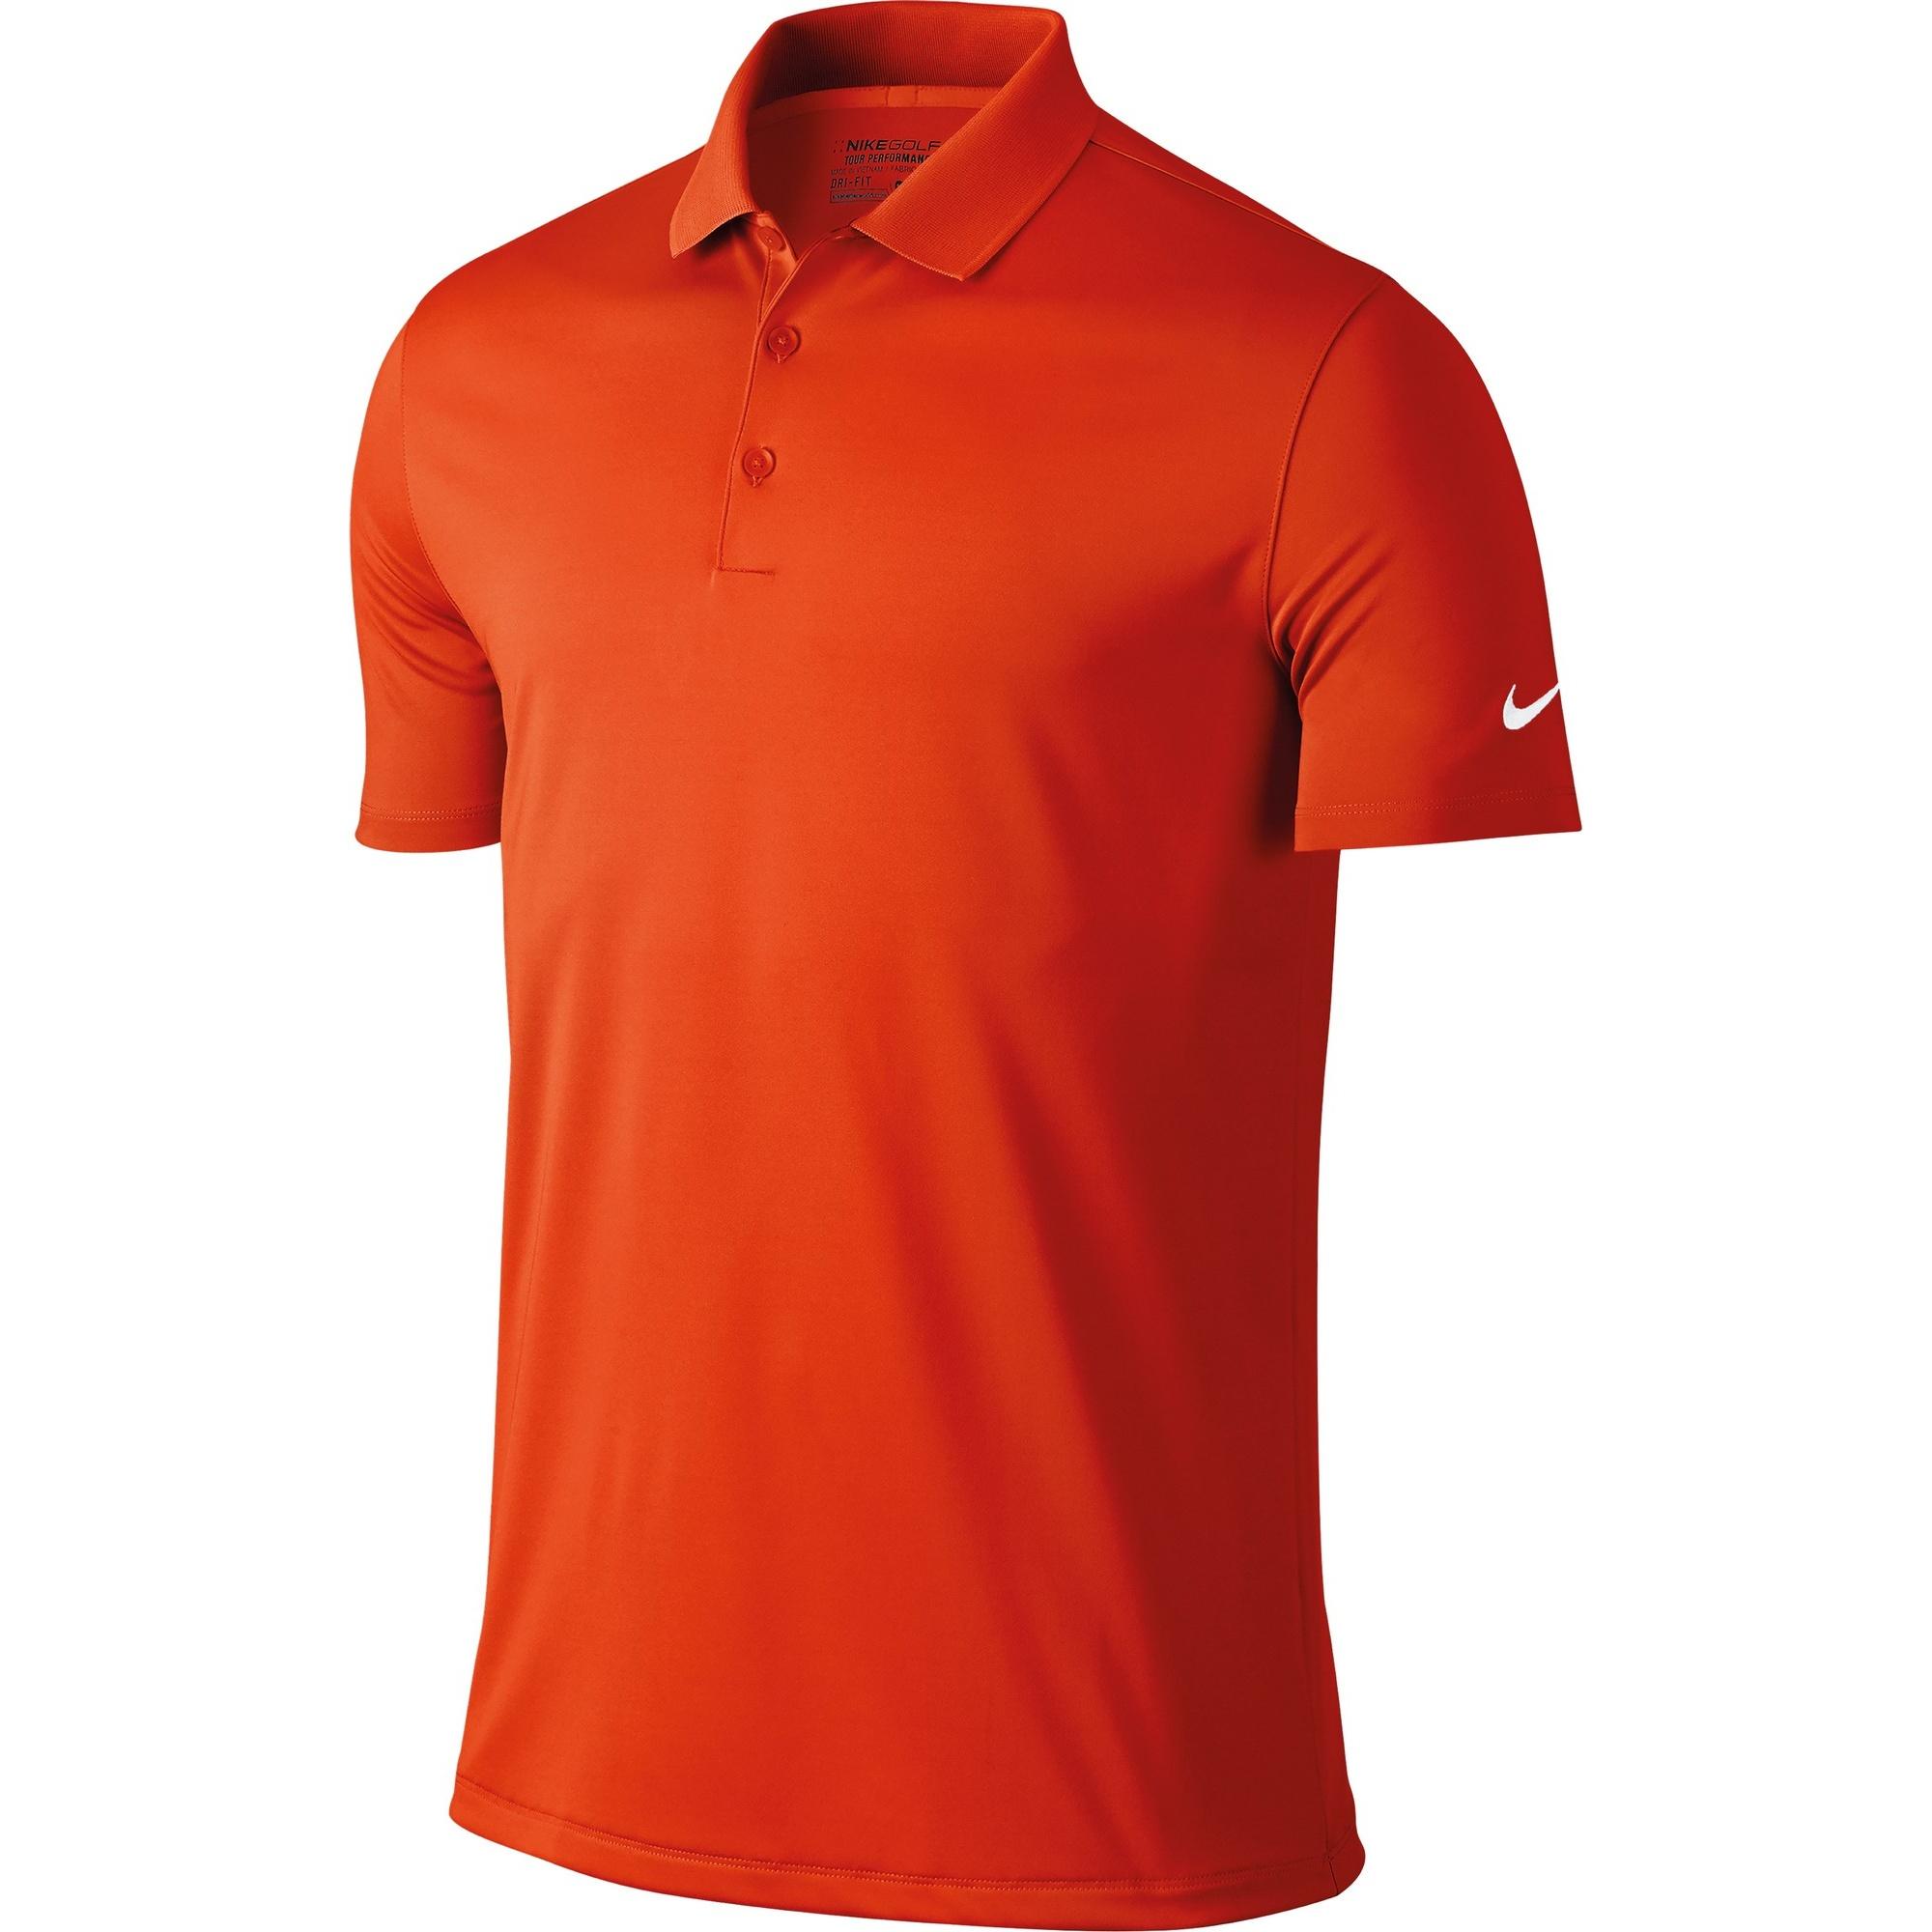 Nike-Mens-Victory-Short-Sleeve-Solid-Polo-Shirt-RW3930